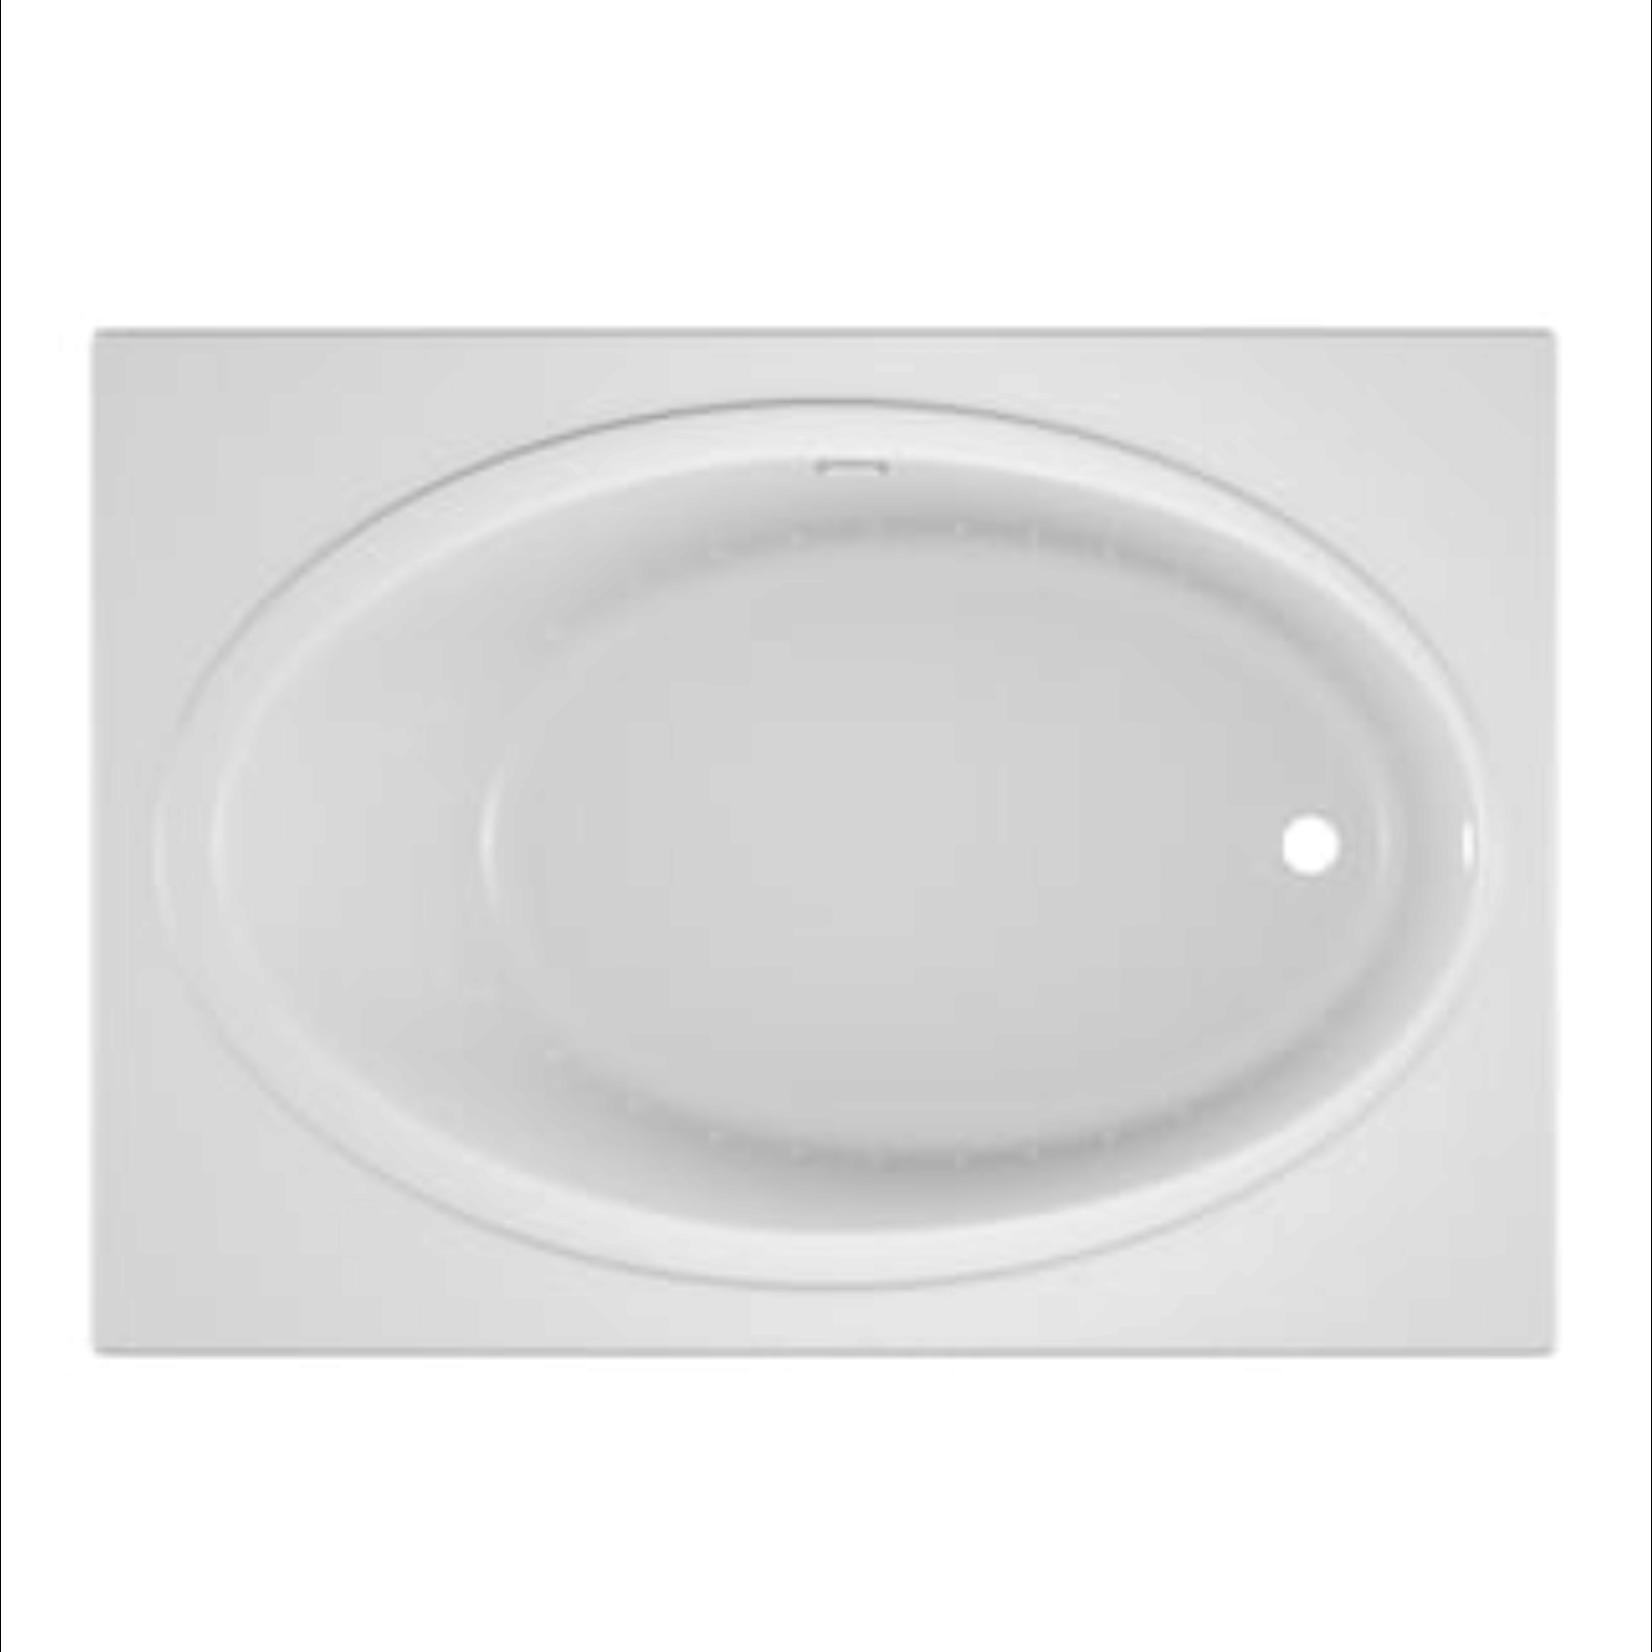 10161 Jacuzzi Nova White Acrylic Drop-In Air Bath